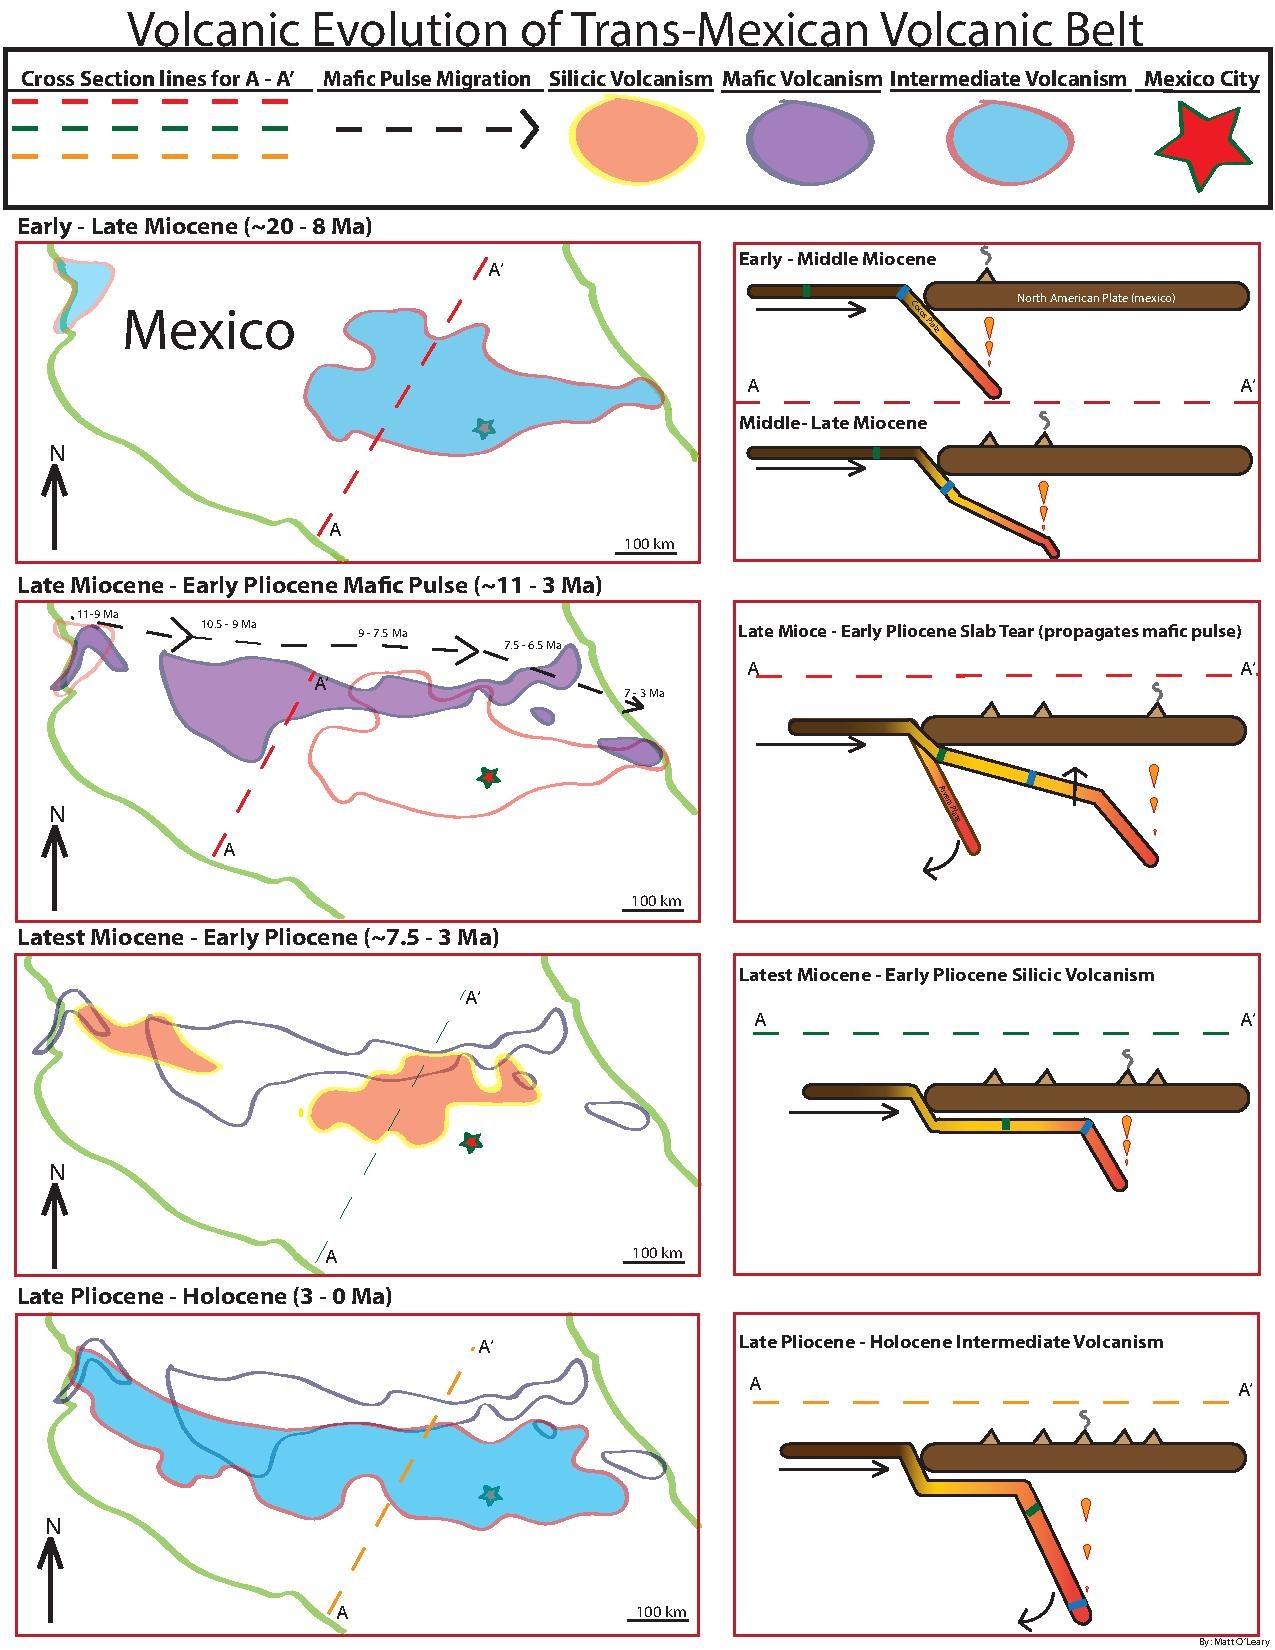 Filevolcanic evolution of trans mexican volcanic beltpdf wikipedia filevolcanic evolution of trans mexican volcanic beltpdf ccuart Image collections